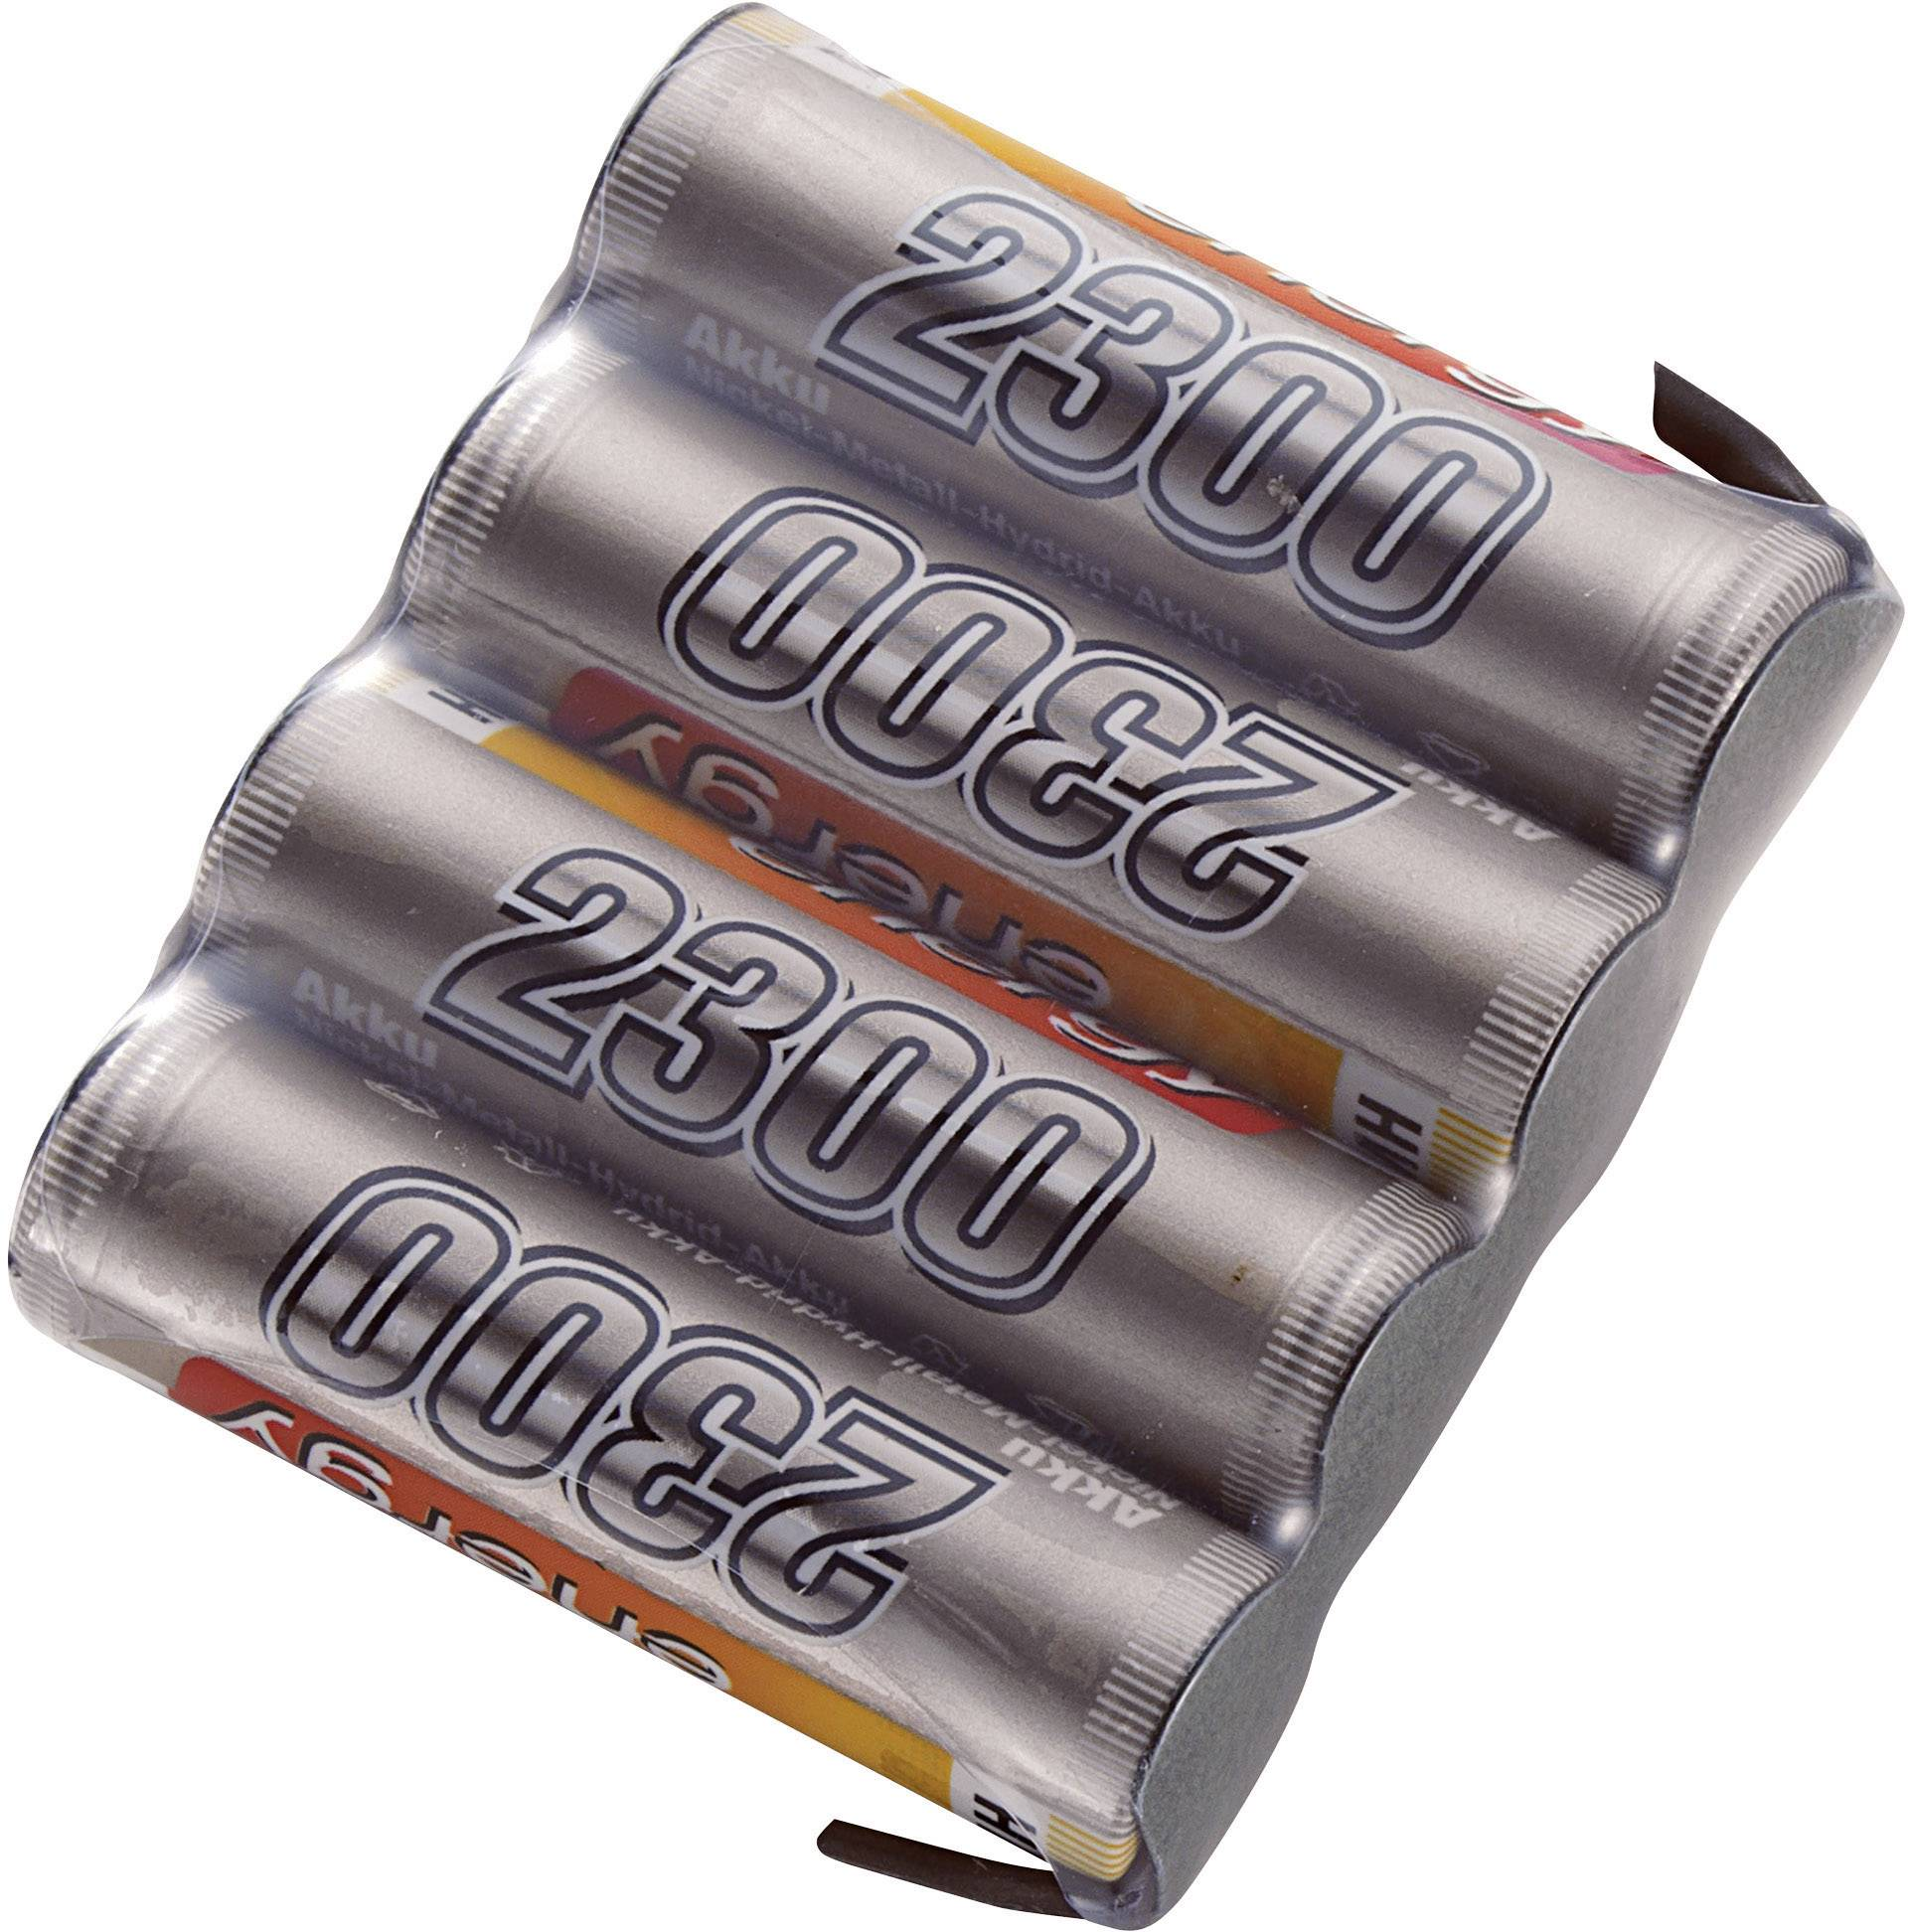 Akupack přijímače NiMH Conrad Energy AA, 4,8 V, 2300 mAh, Side by Side, s páj. hroty